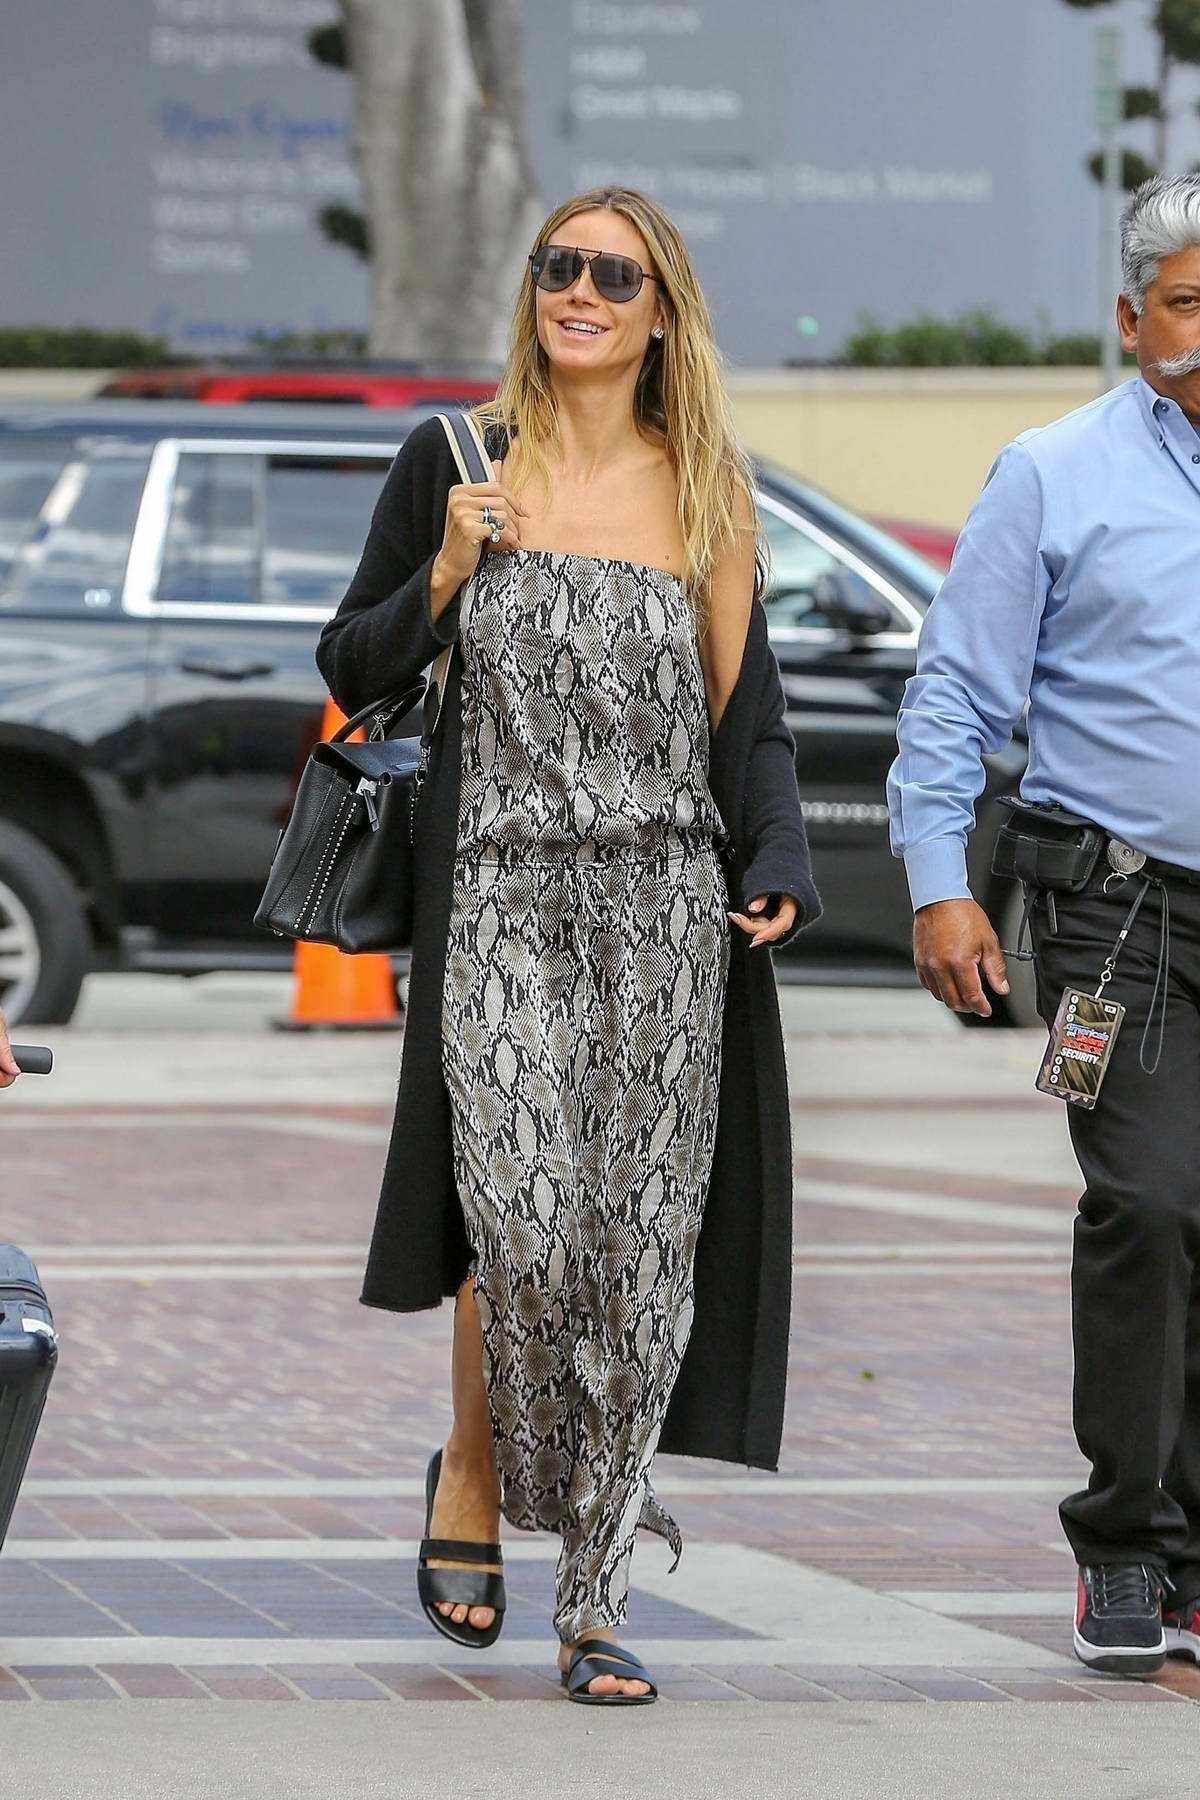 Heidi Klum wearing snakeskin print dress as she arrives to tape 'America's Got Talent' in Los Angeles